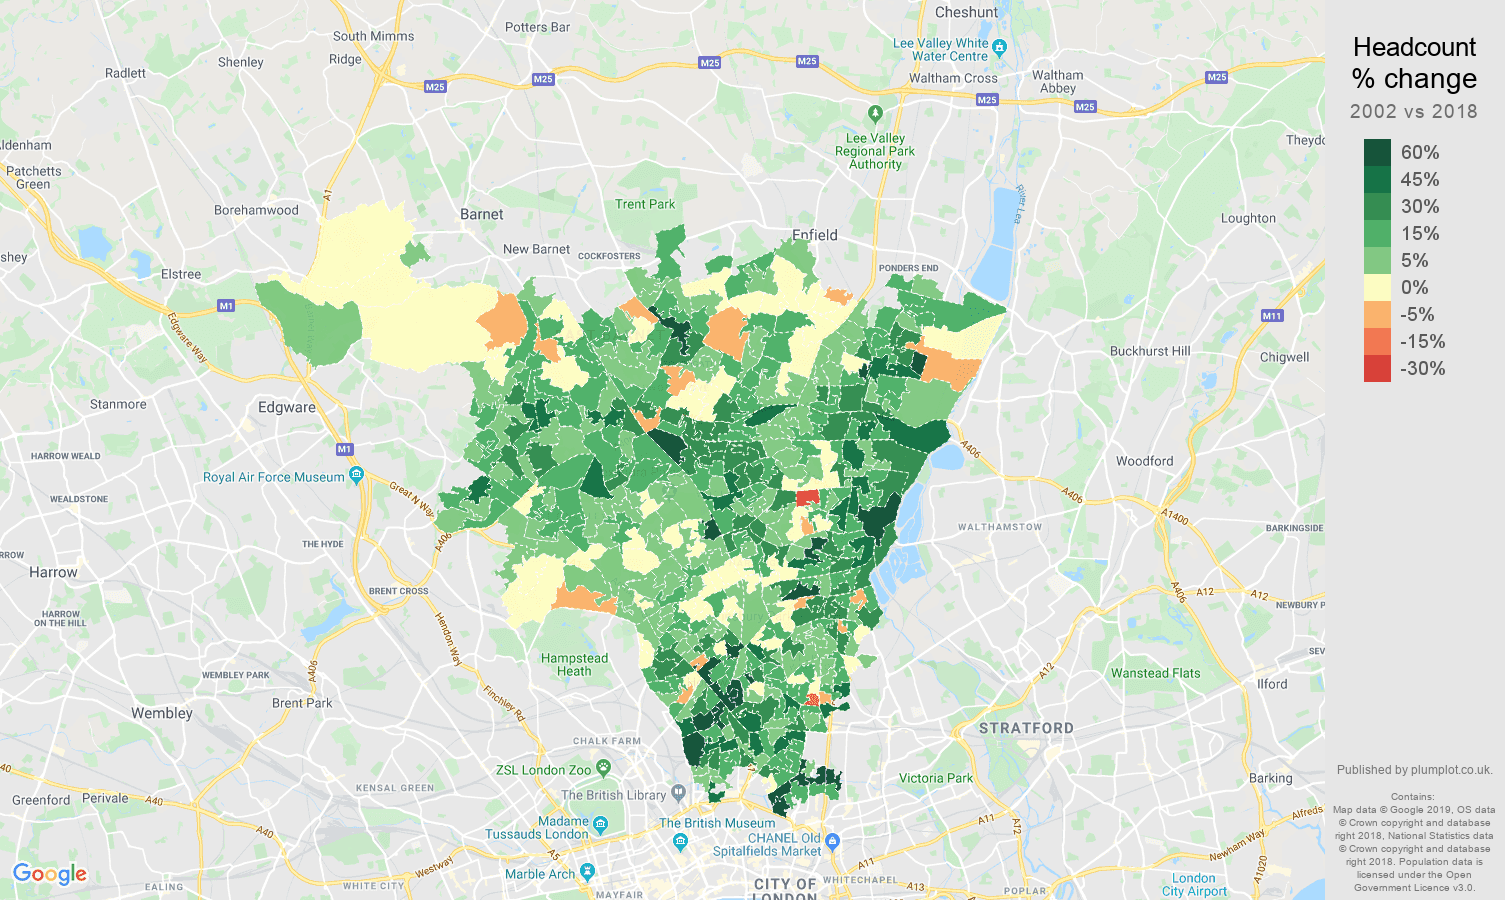 North London headcount change map